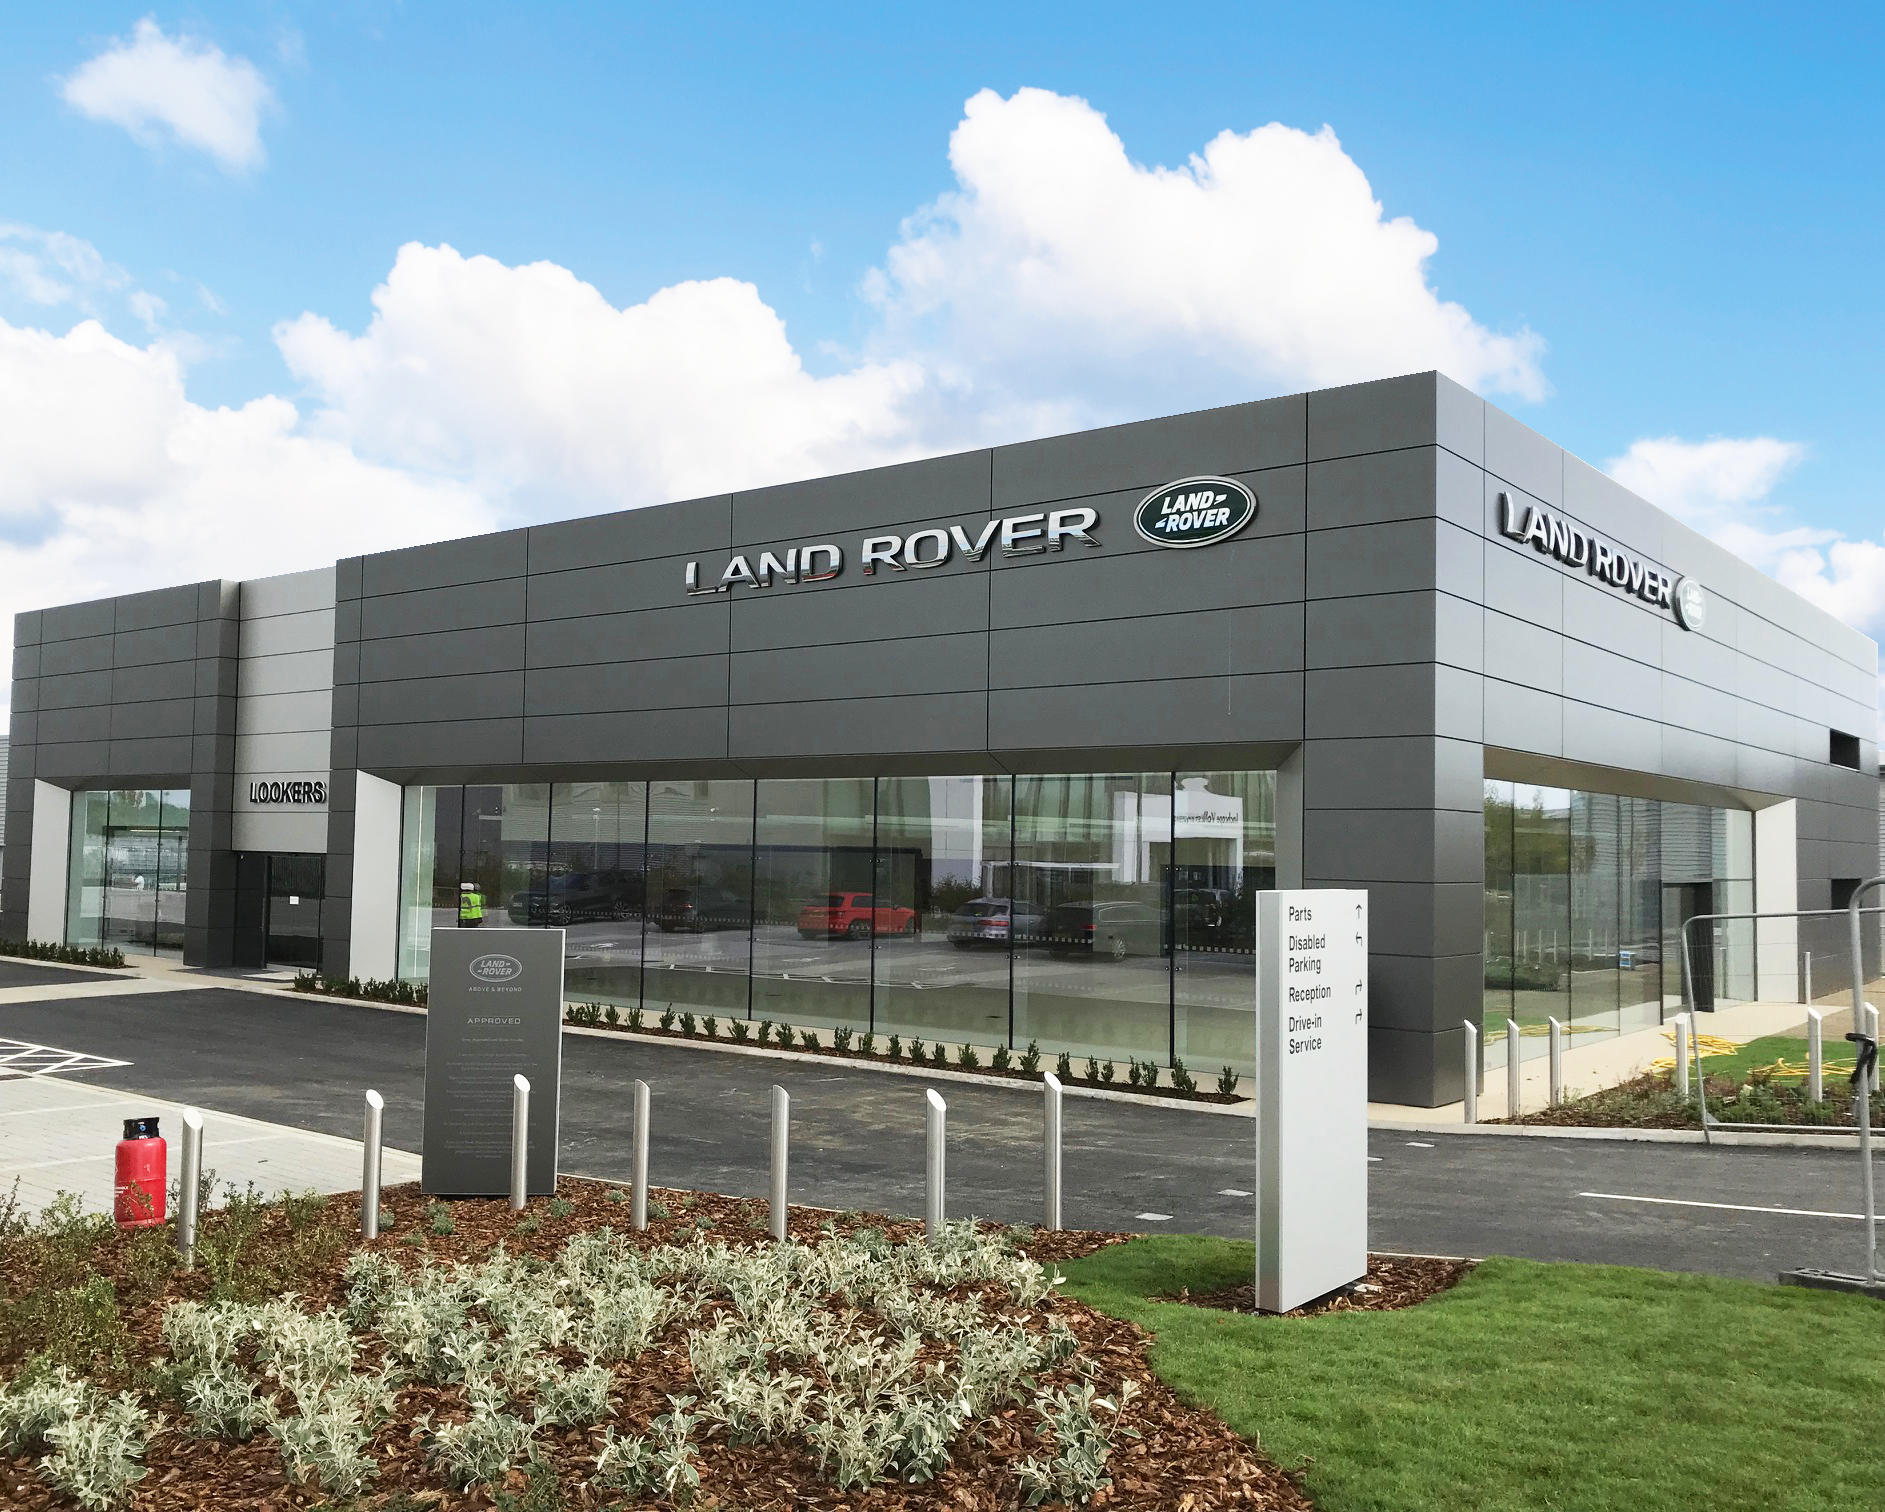 lookers land rover colchester colchester car dealers. Black Bedroom Furniture Sets. Home Design Ideas